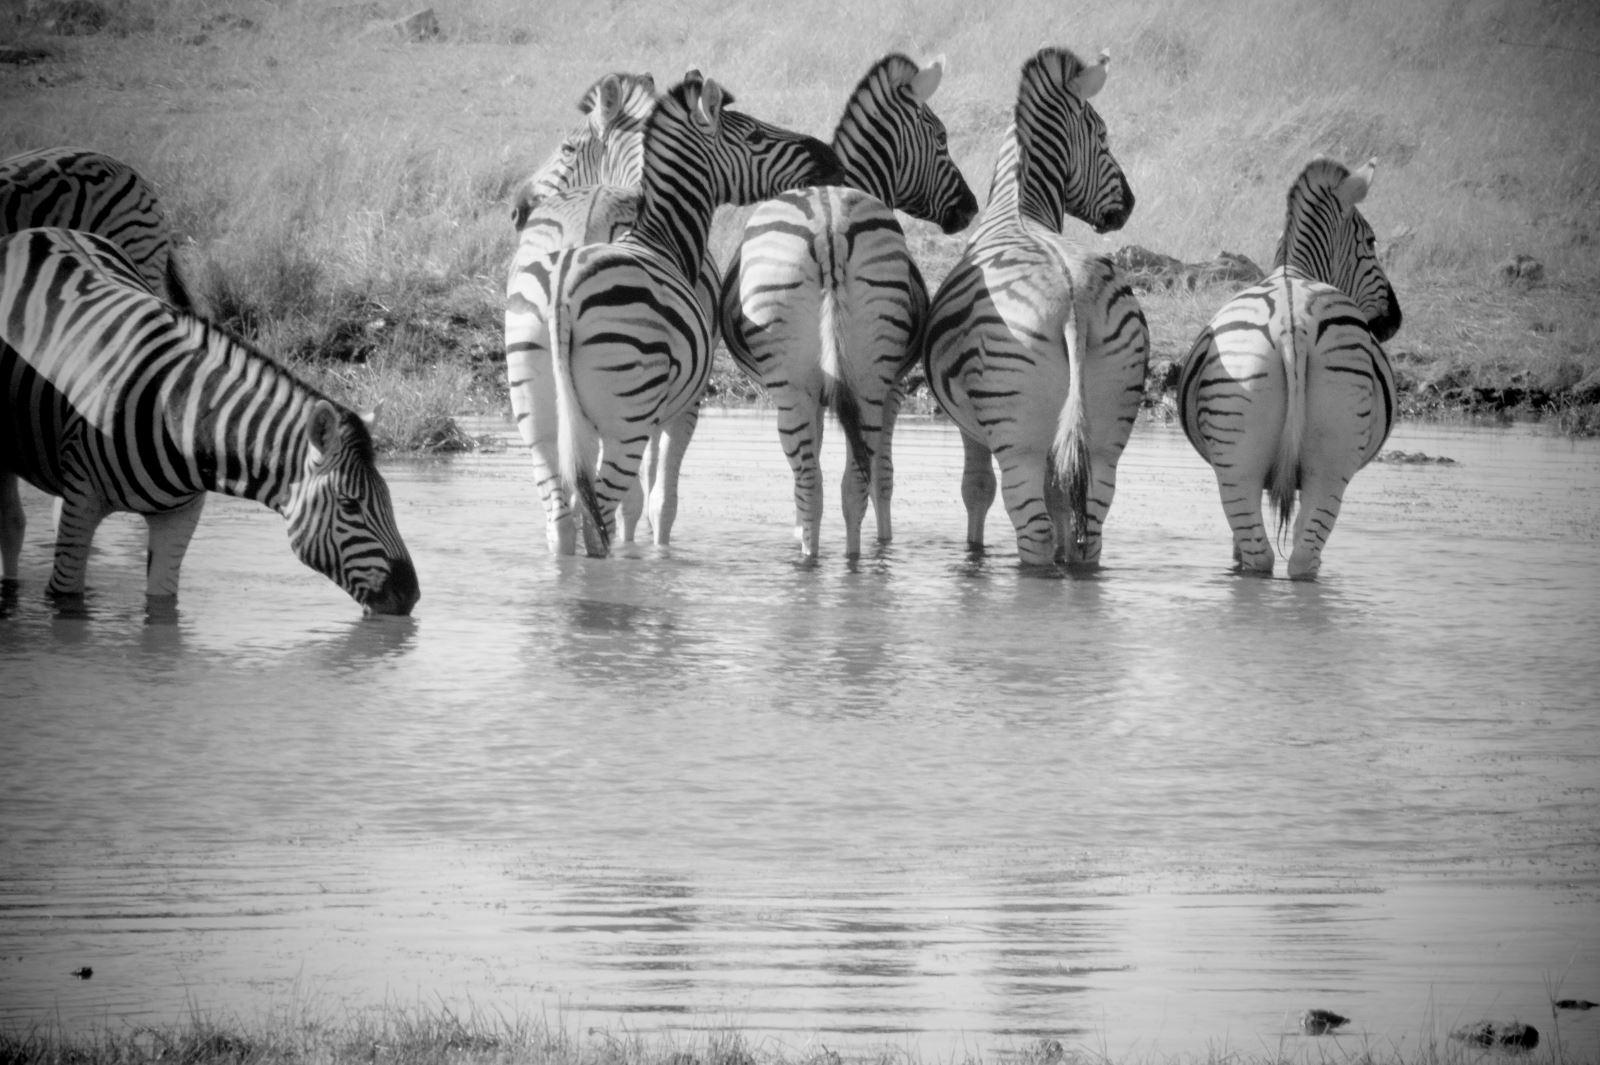 Namibia, Waterhole, Etosha National Park, Safari, Zebra